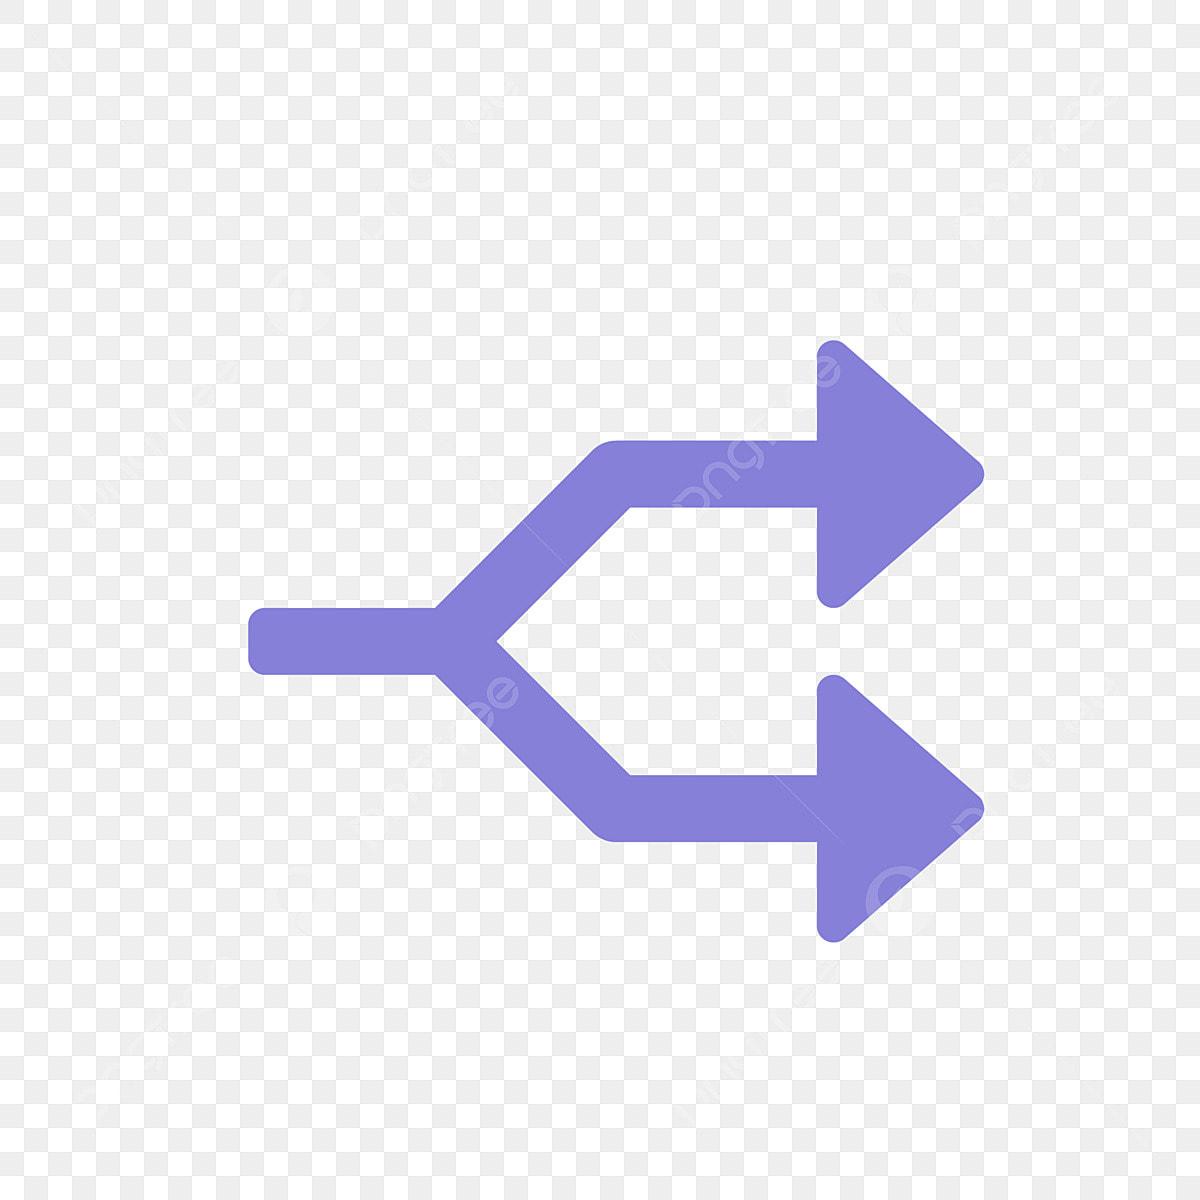 Black Arrow png download - 512*512 - Free Transparent Arrow png Download. -  CleanPNG / KissPNG